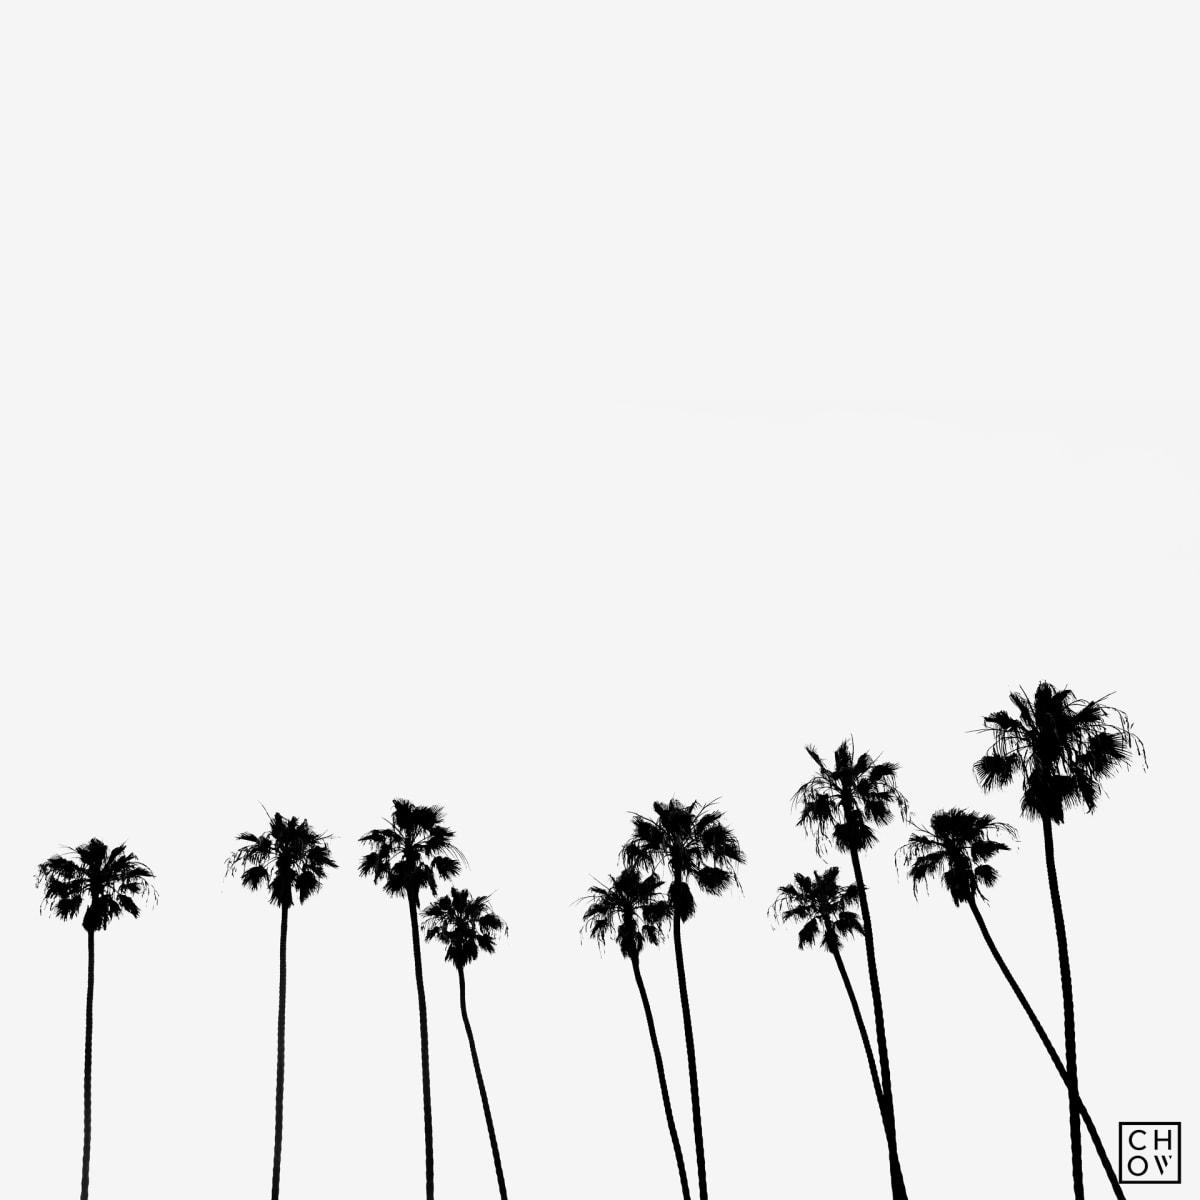 Austin Chow, Palms // California, 2018